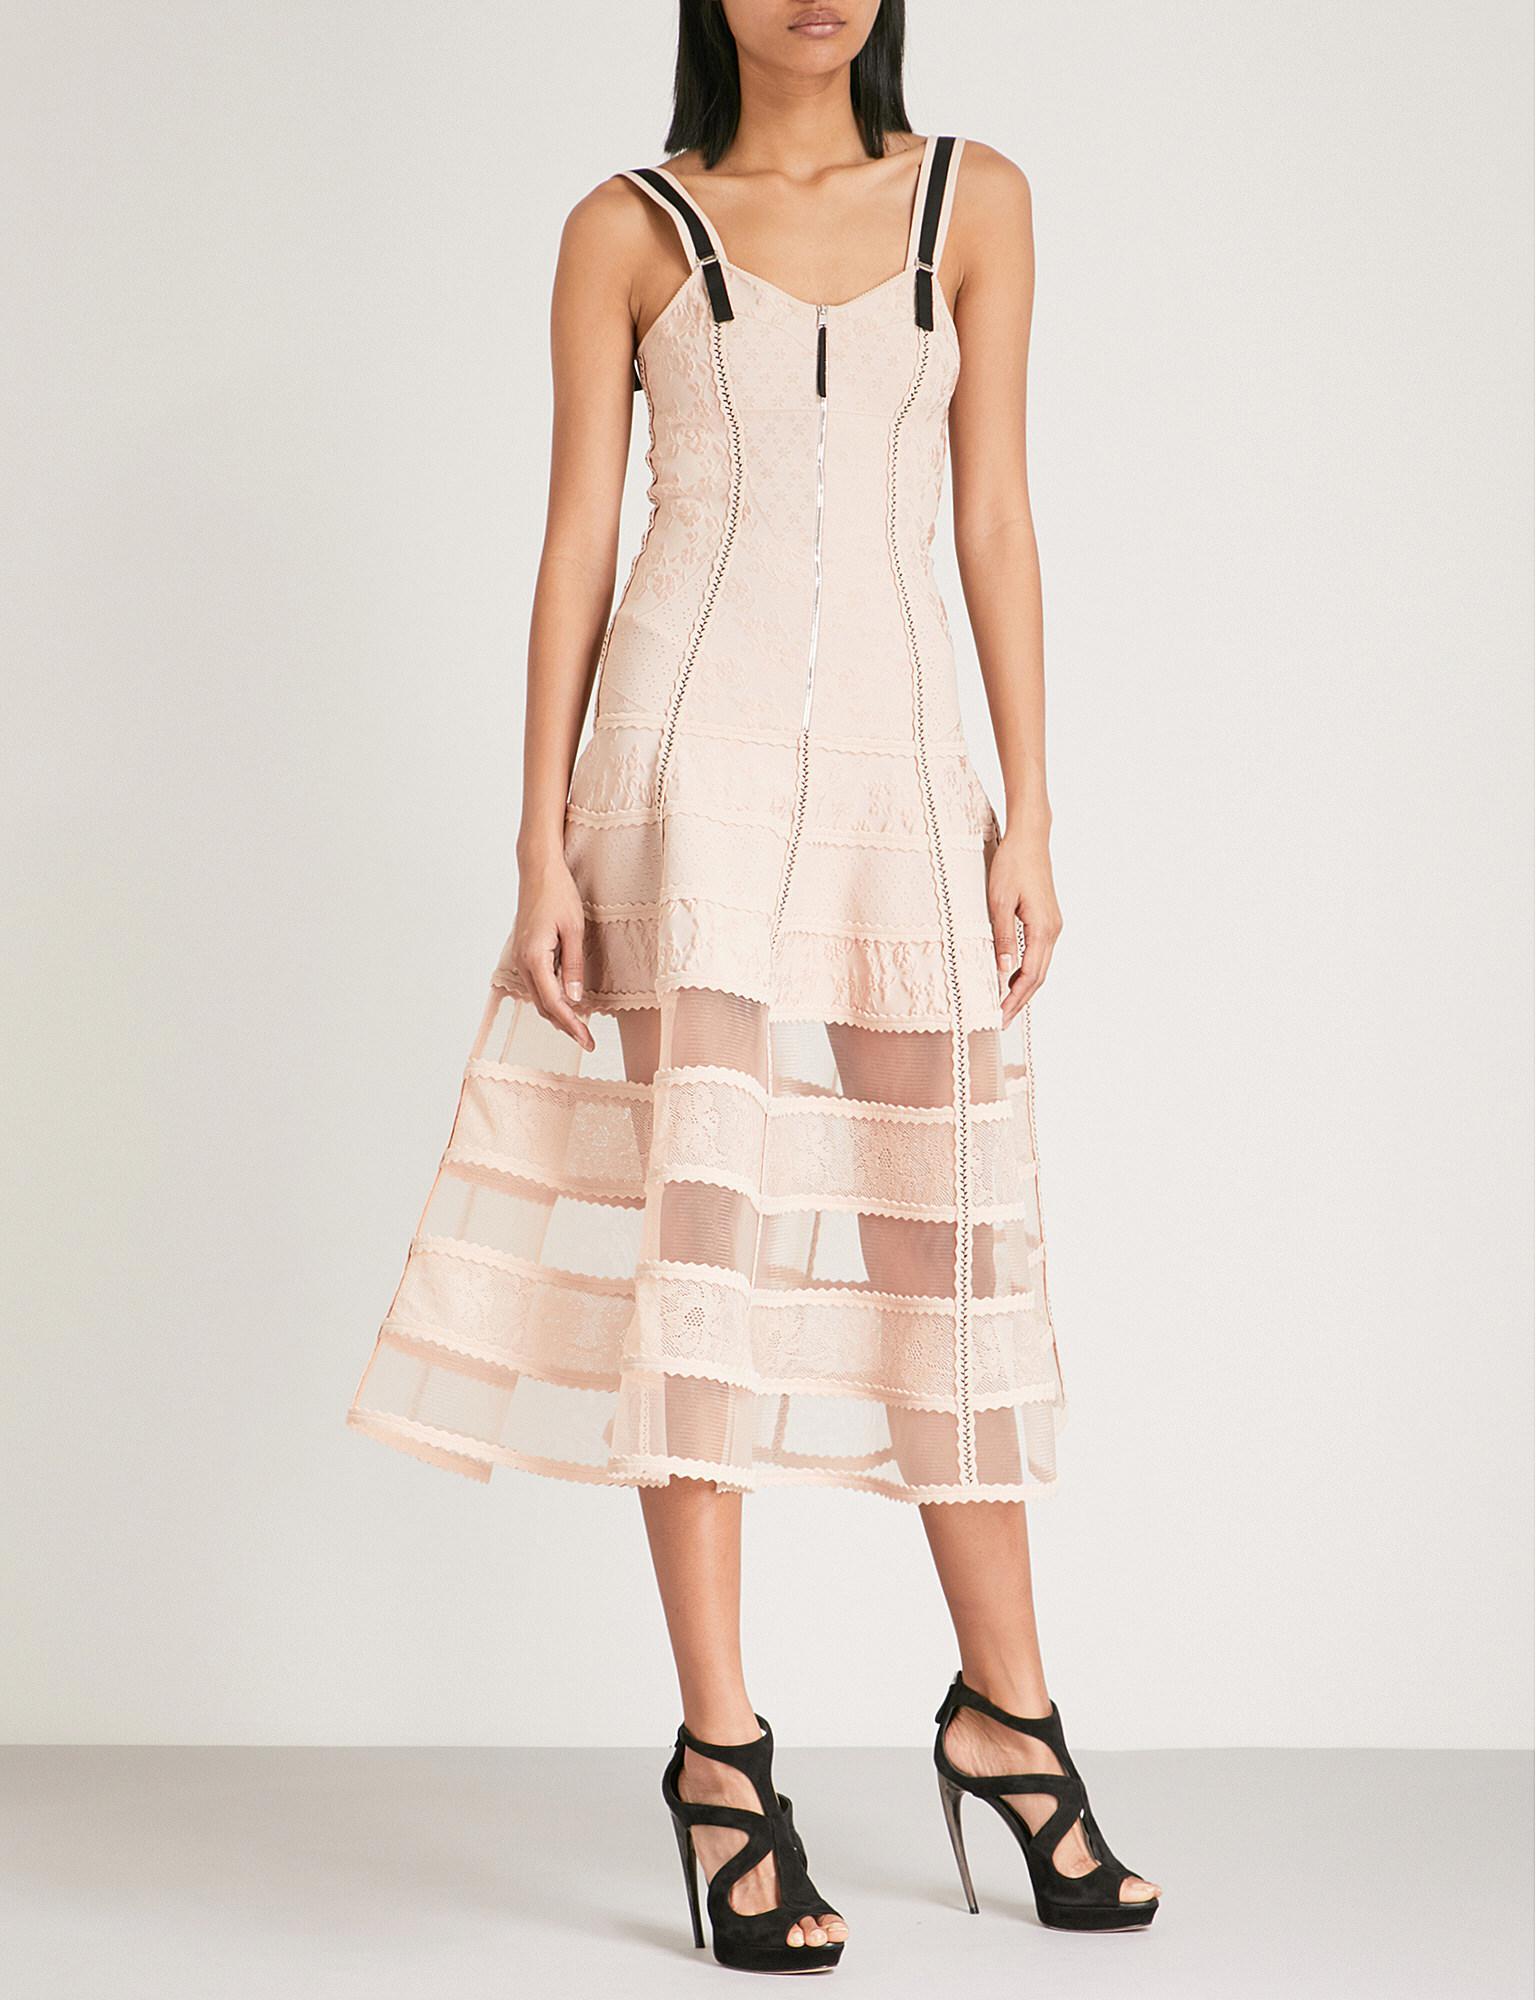 2e2963bc56 Alexander Mcqueen Bustier Jacquard-knit Dress in Pink - Lyst